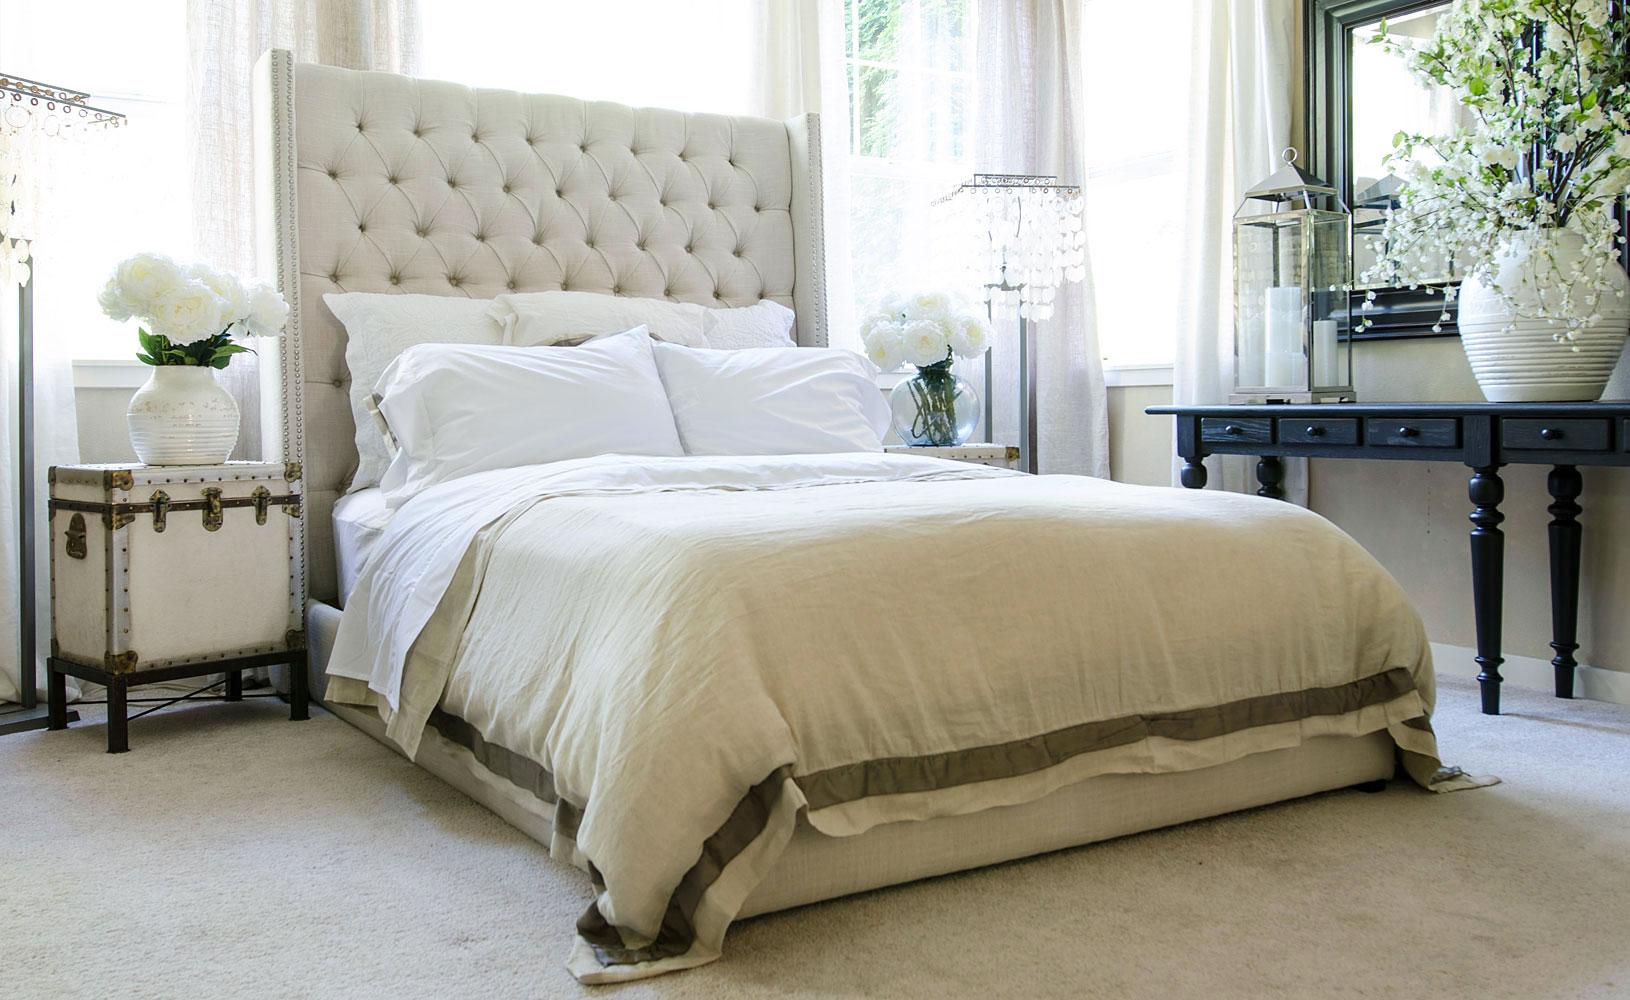 Sleeping In Your Living Room